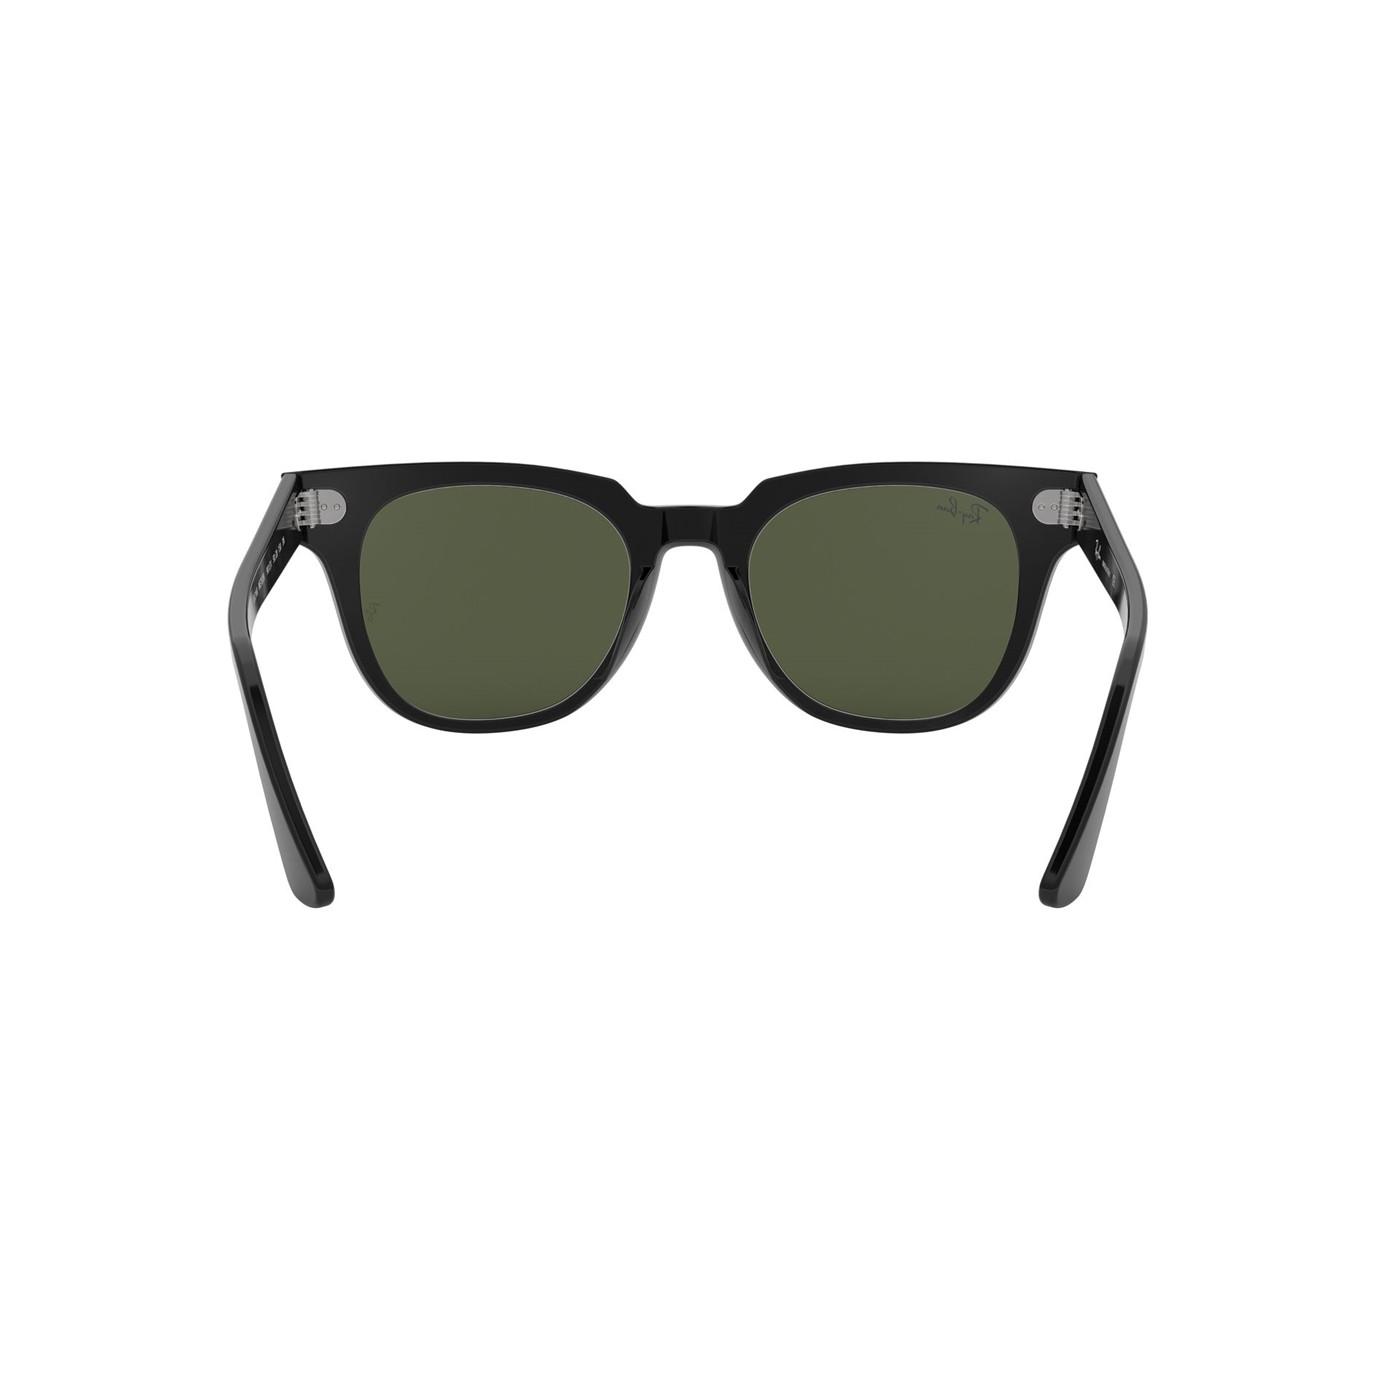 0f43b950240 Ray-Ban Meteor Black Zonnebril RB21689013150 - Sunglasses